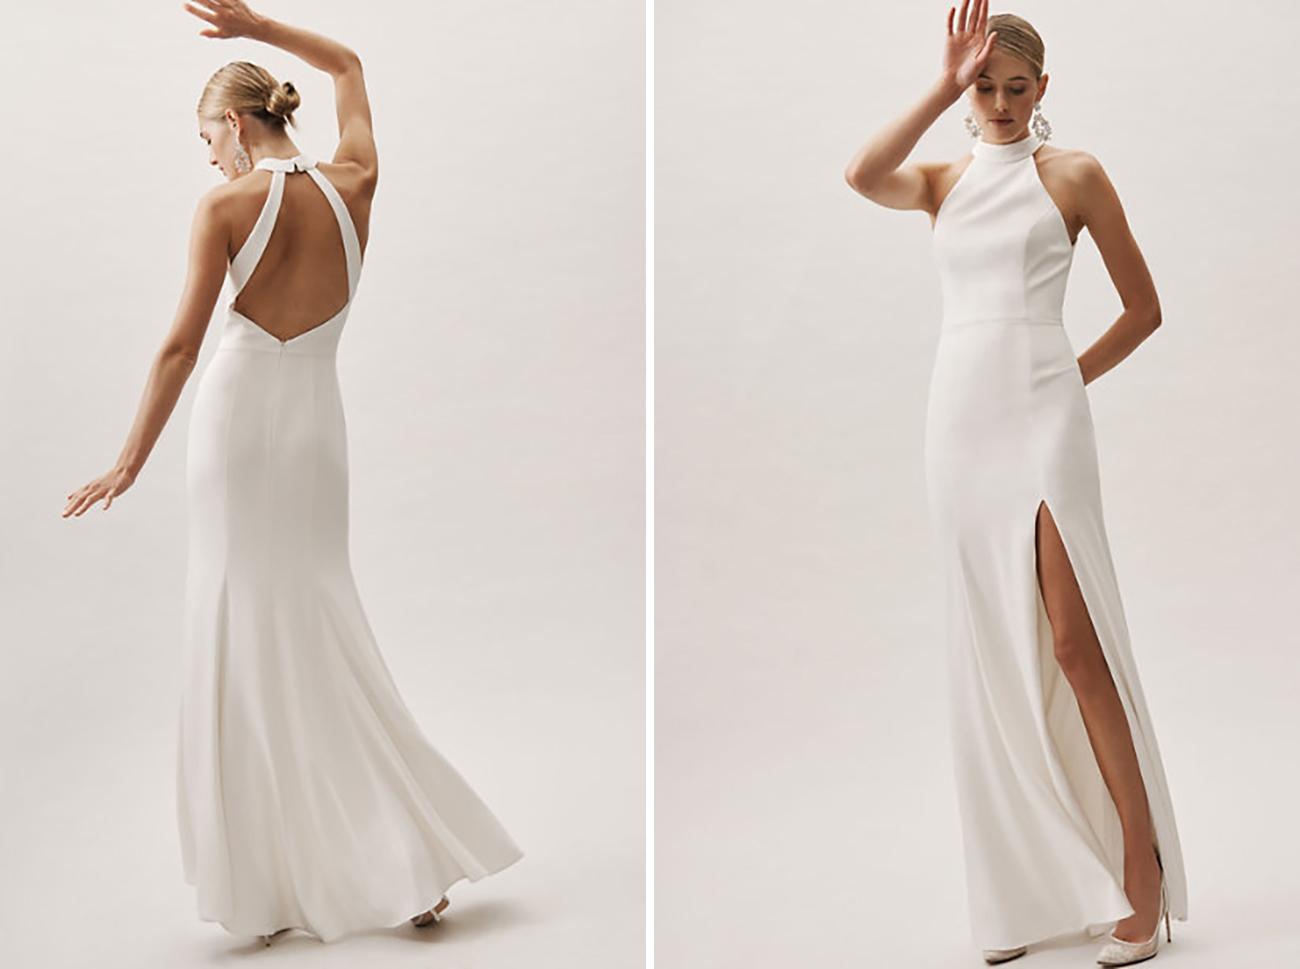 BHLDN Modern Simple Minimalistic Wedding Dress Under $800 Budget